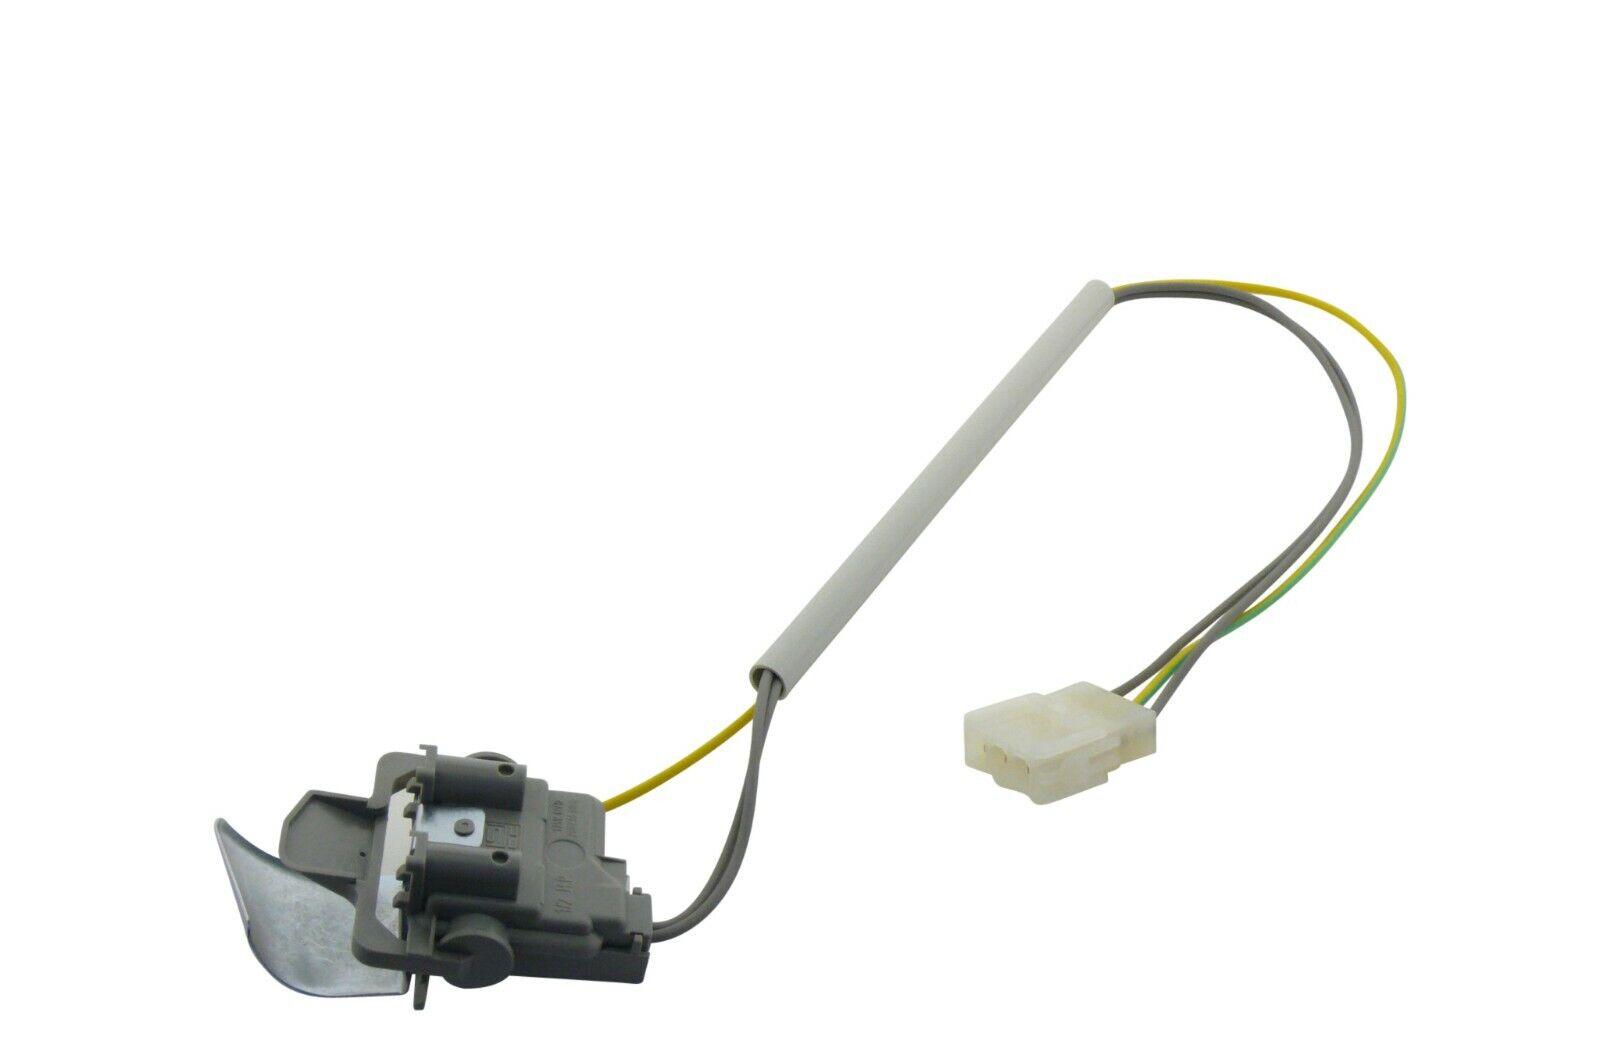 W10156252  W10415 Whirlpool Washer Water Level Pressure Switch WPW10415587 Fit